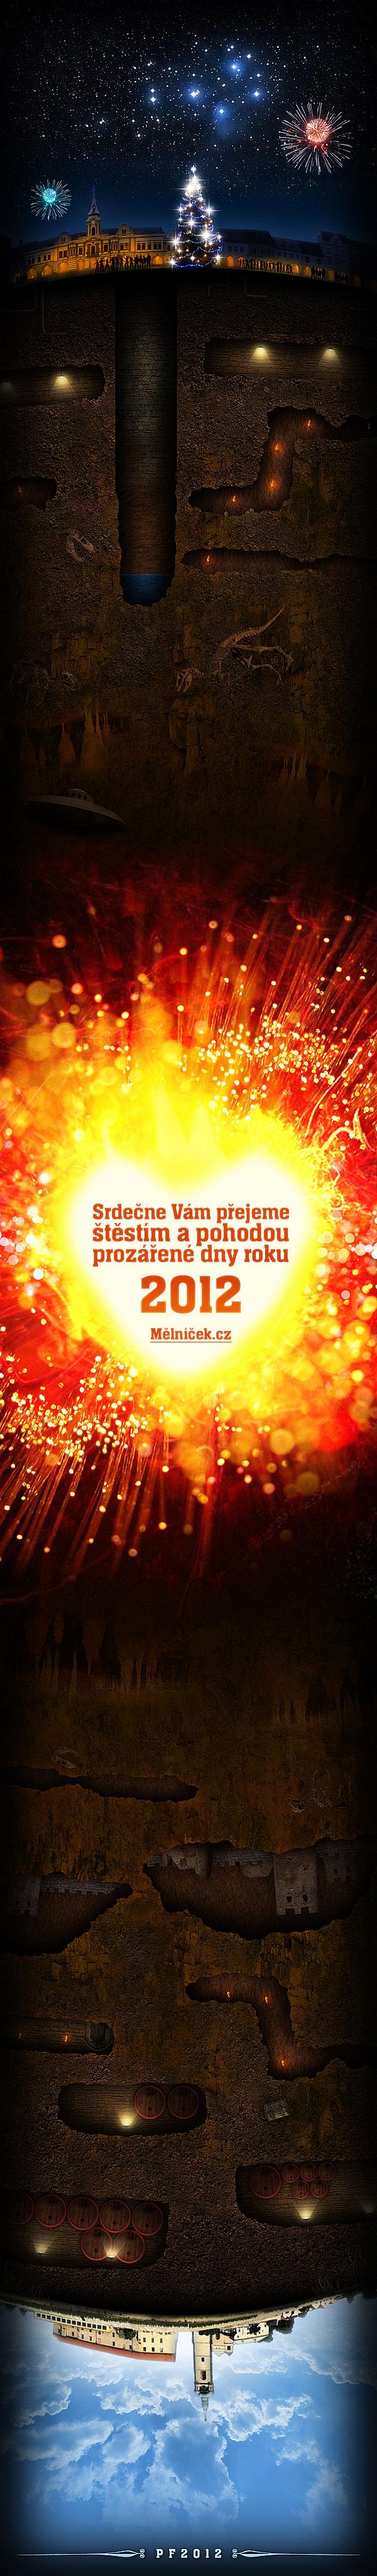 Melnicek.cz - PF2012